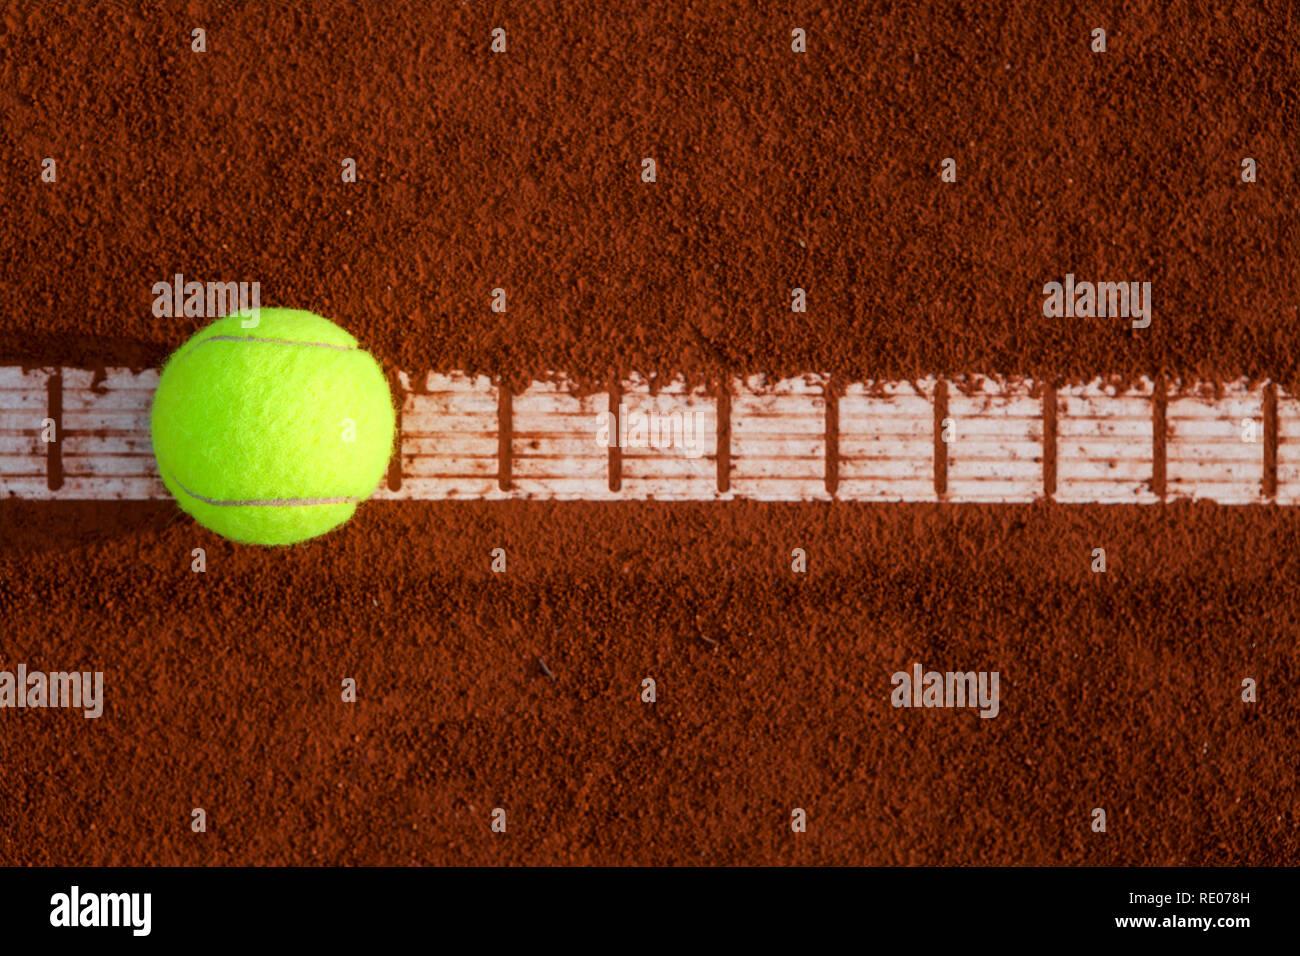 Tennisball on line, in - Stock Image